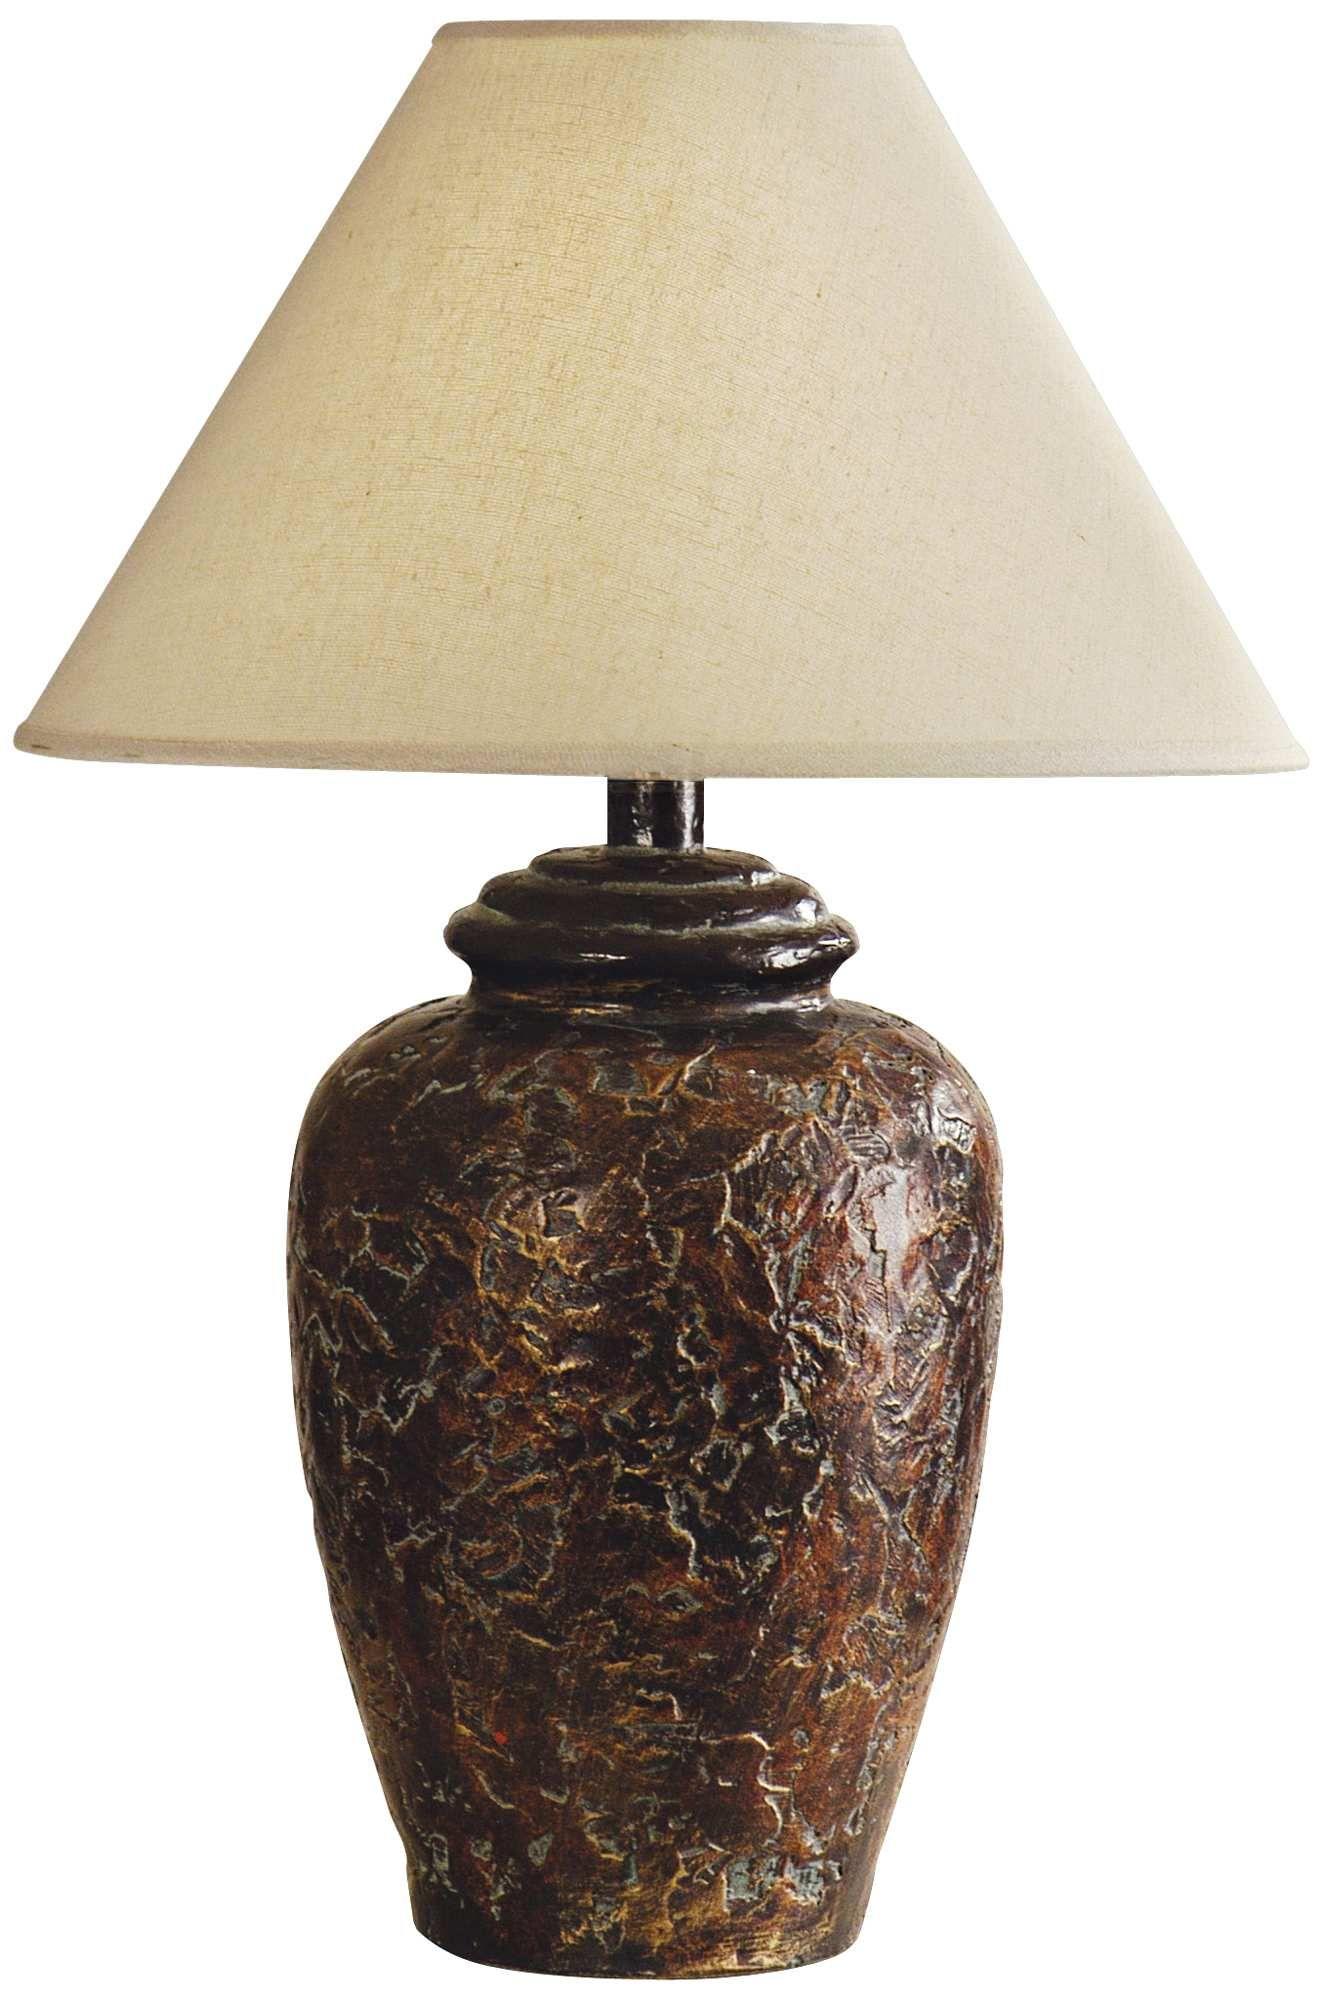 Auburn Hammered Bronze Table Lamp V4294 Lamps Plus In 2020